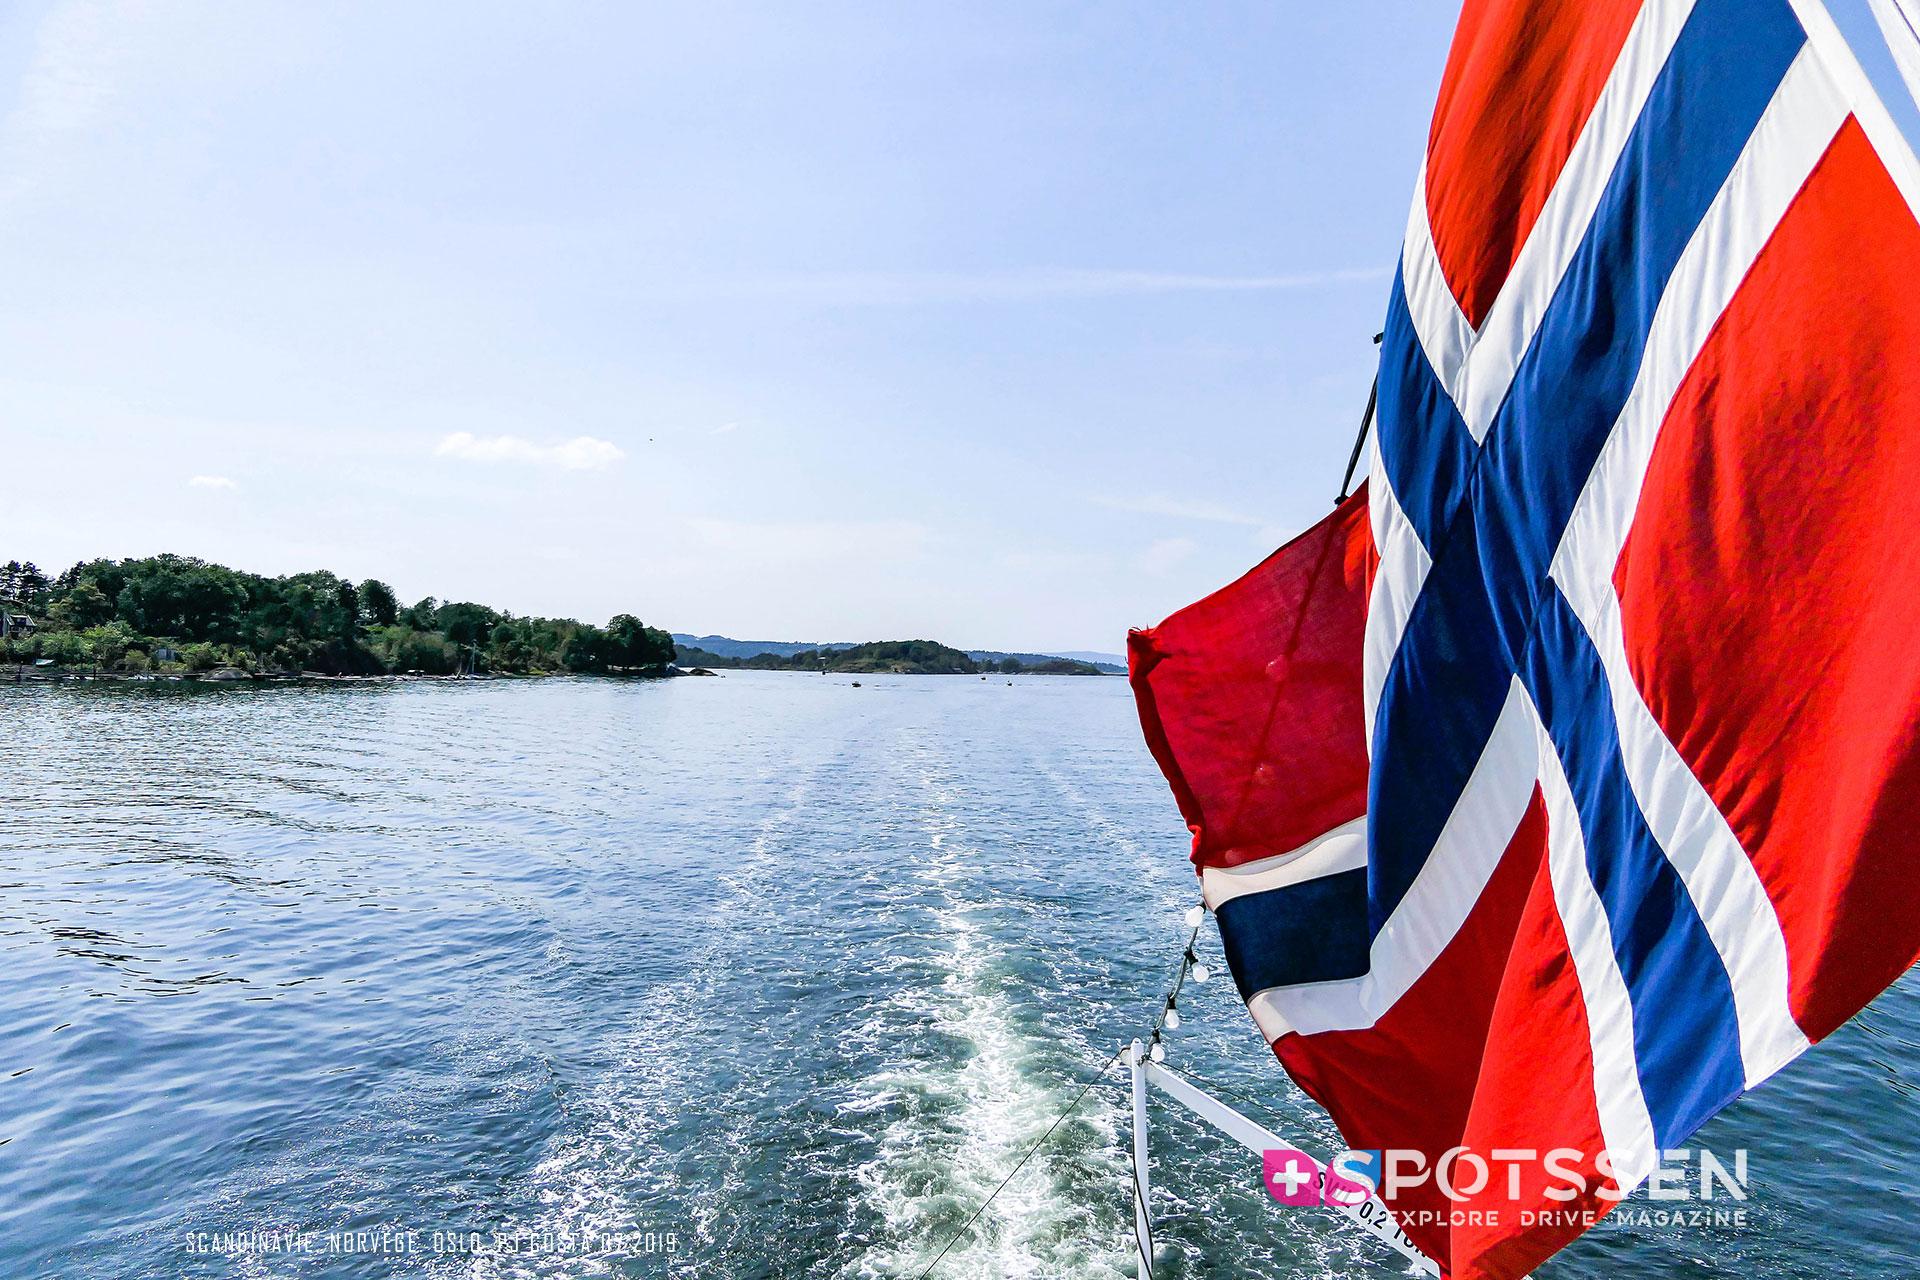 2019, oslo, norvège